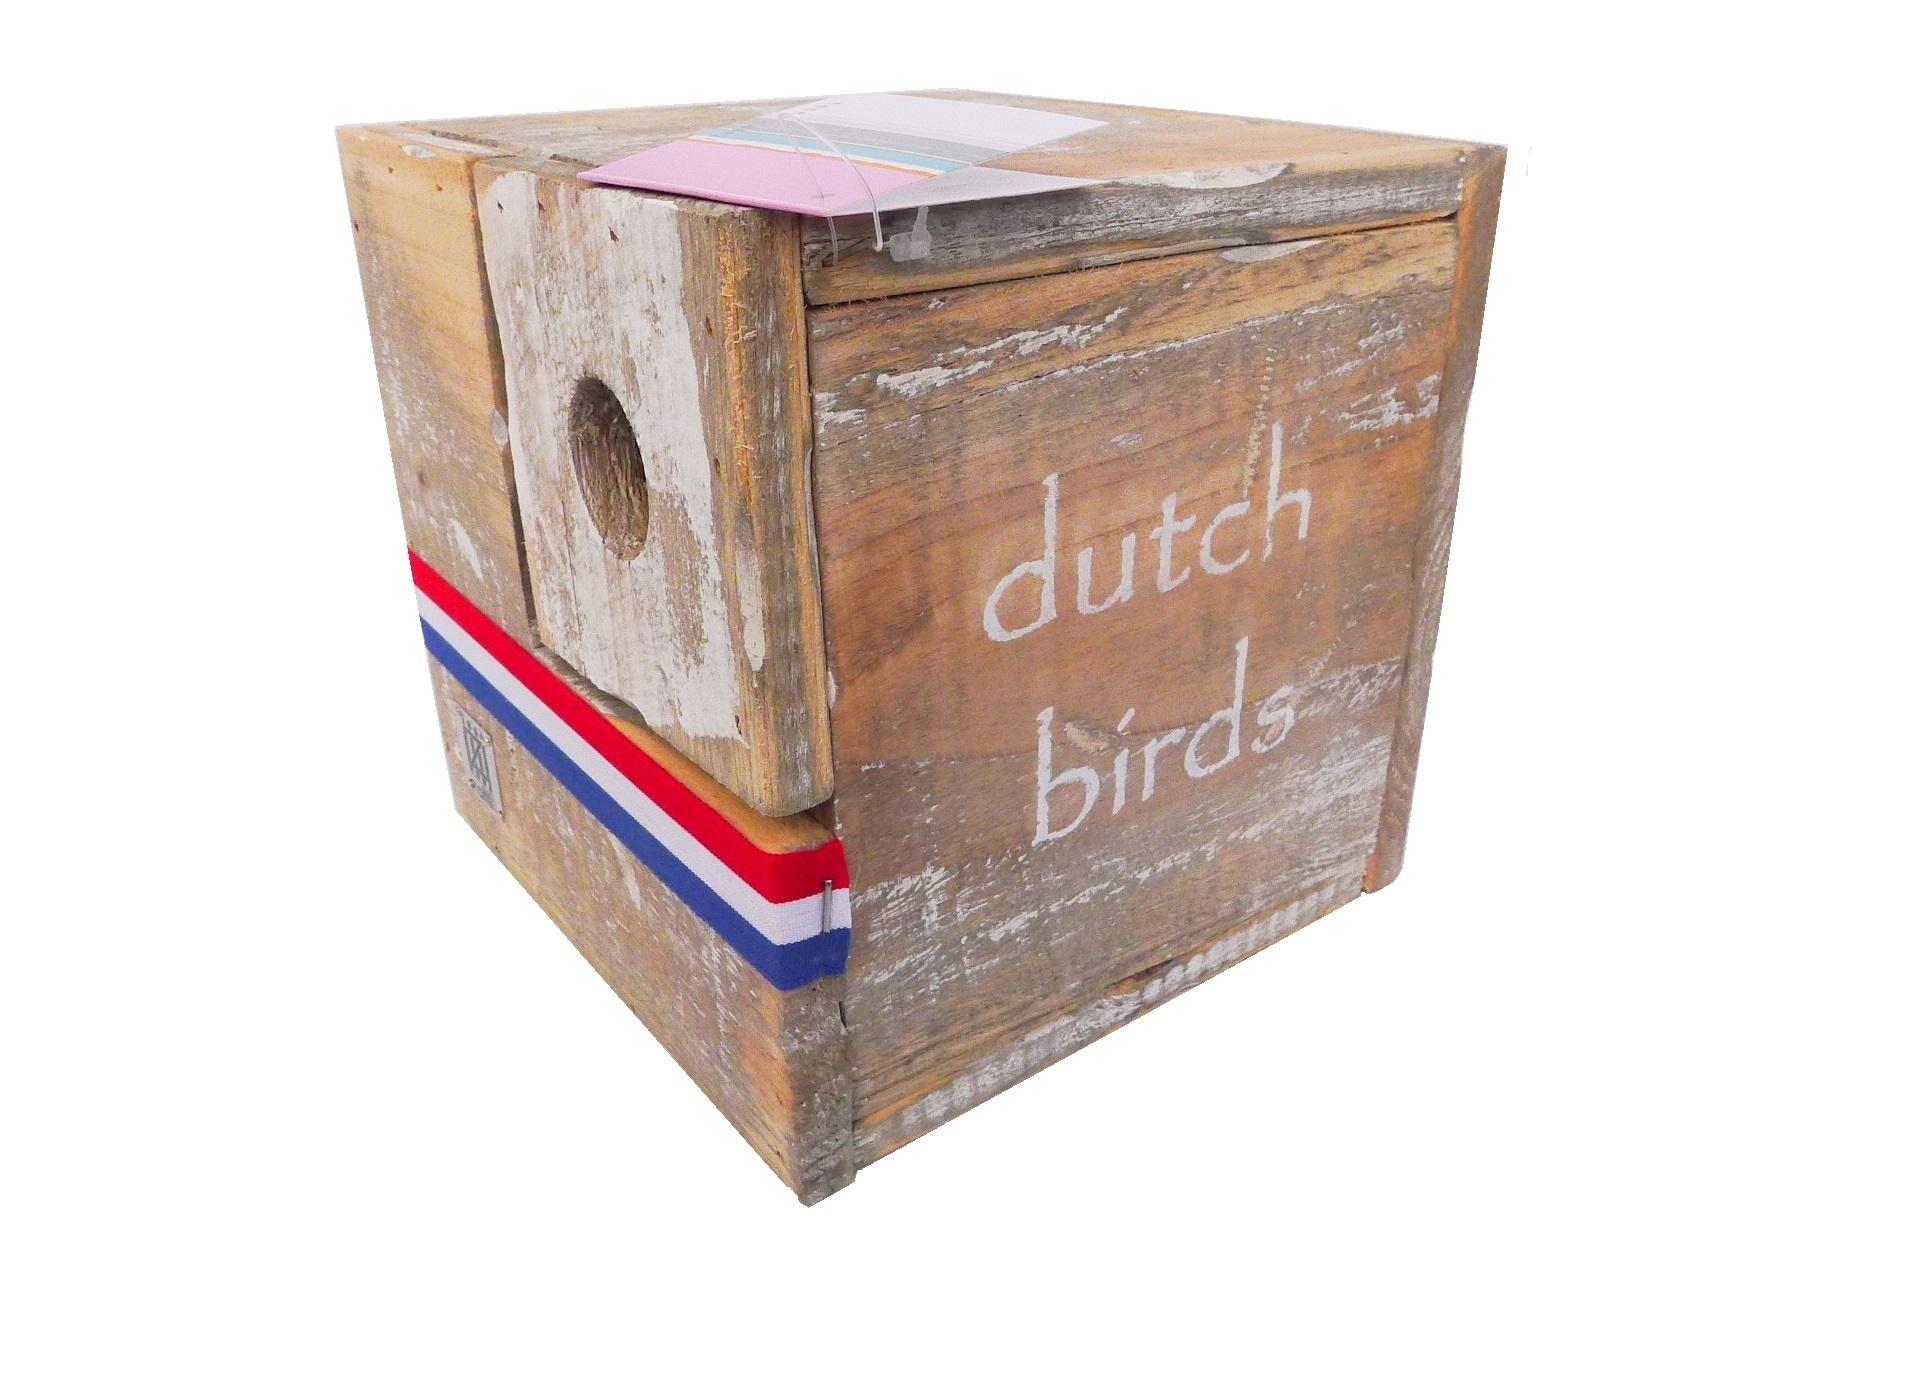 birdhouse old dutch StB square-6